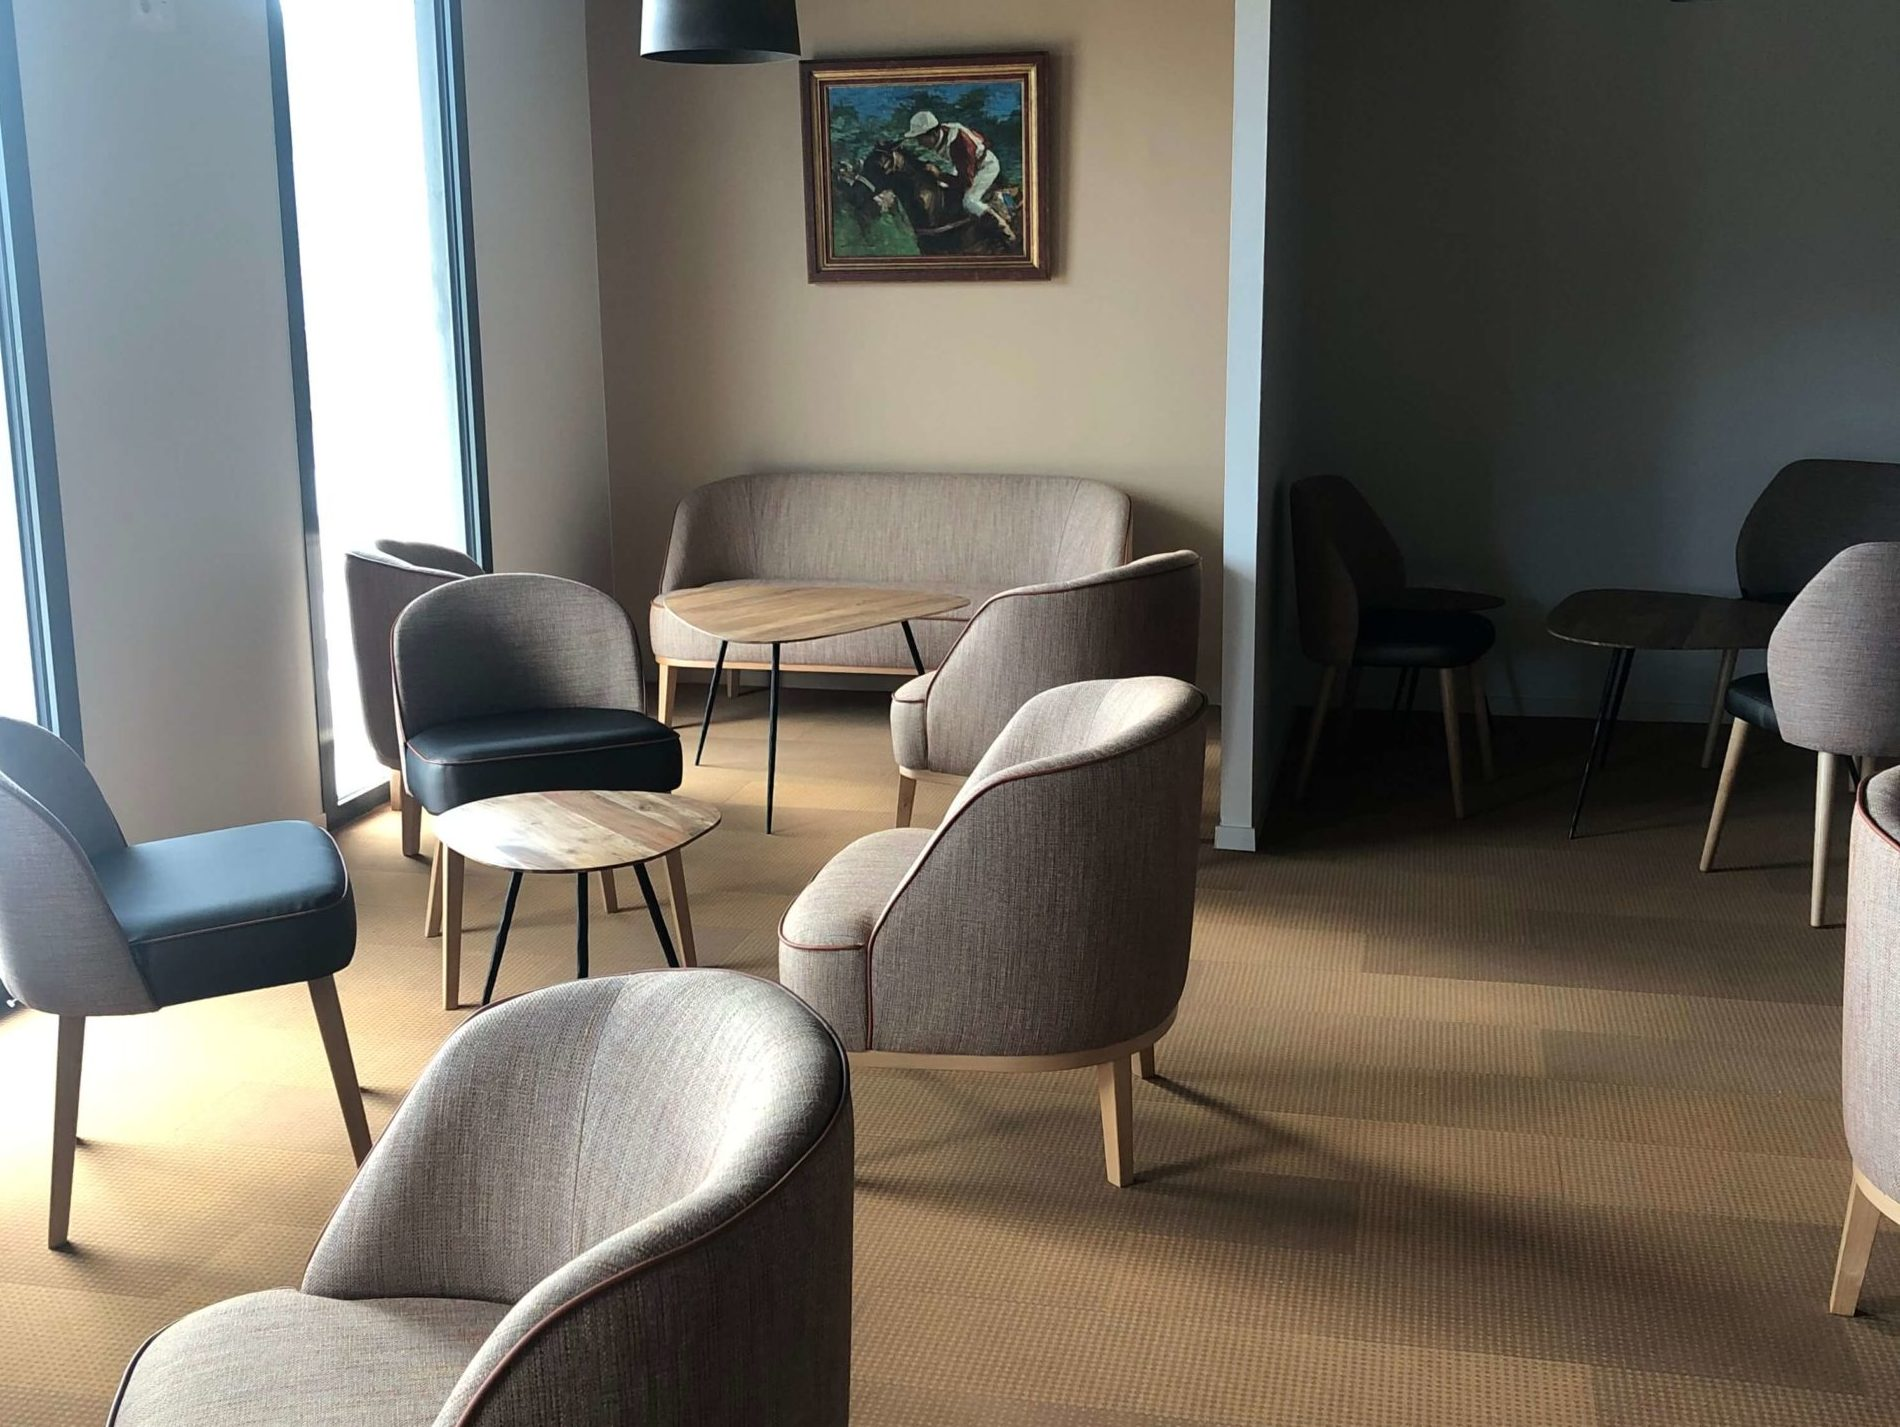 Imm hôtel 1, 56800 Ploermel